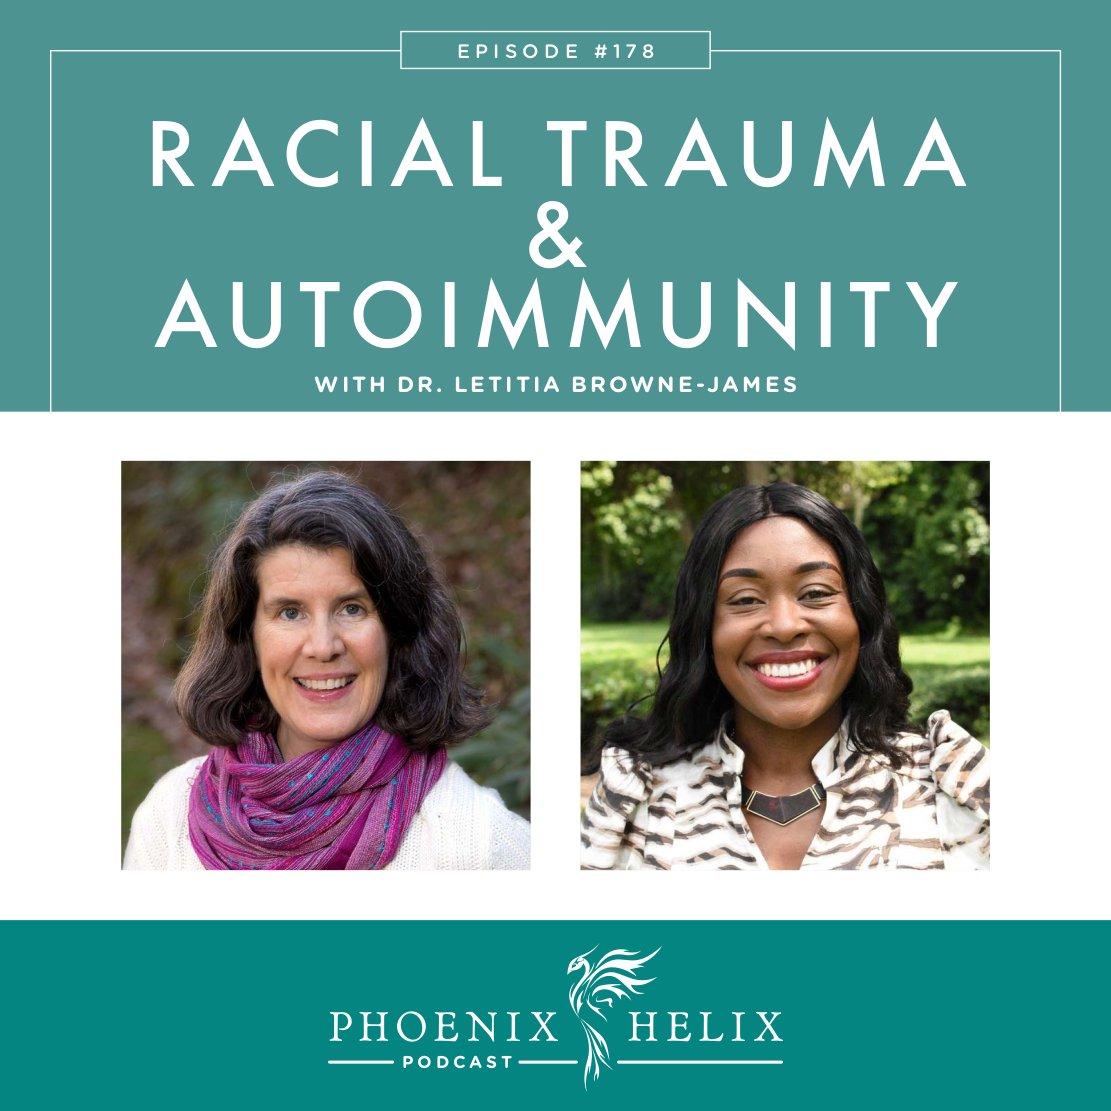 Racial Trauma & Autoimmune Disease with Dr. Letitia Browne-James | Phoenix Helix